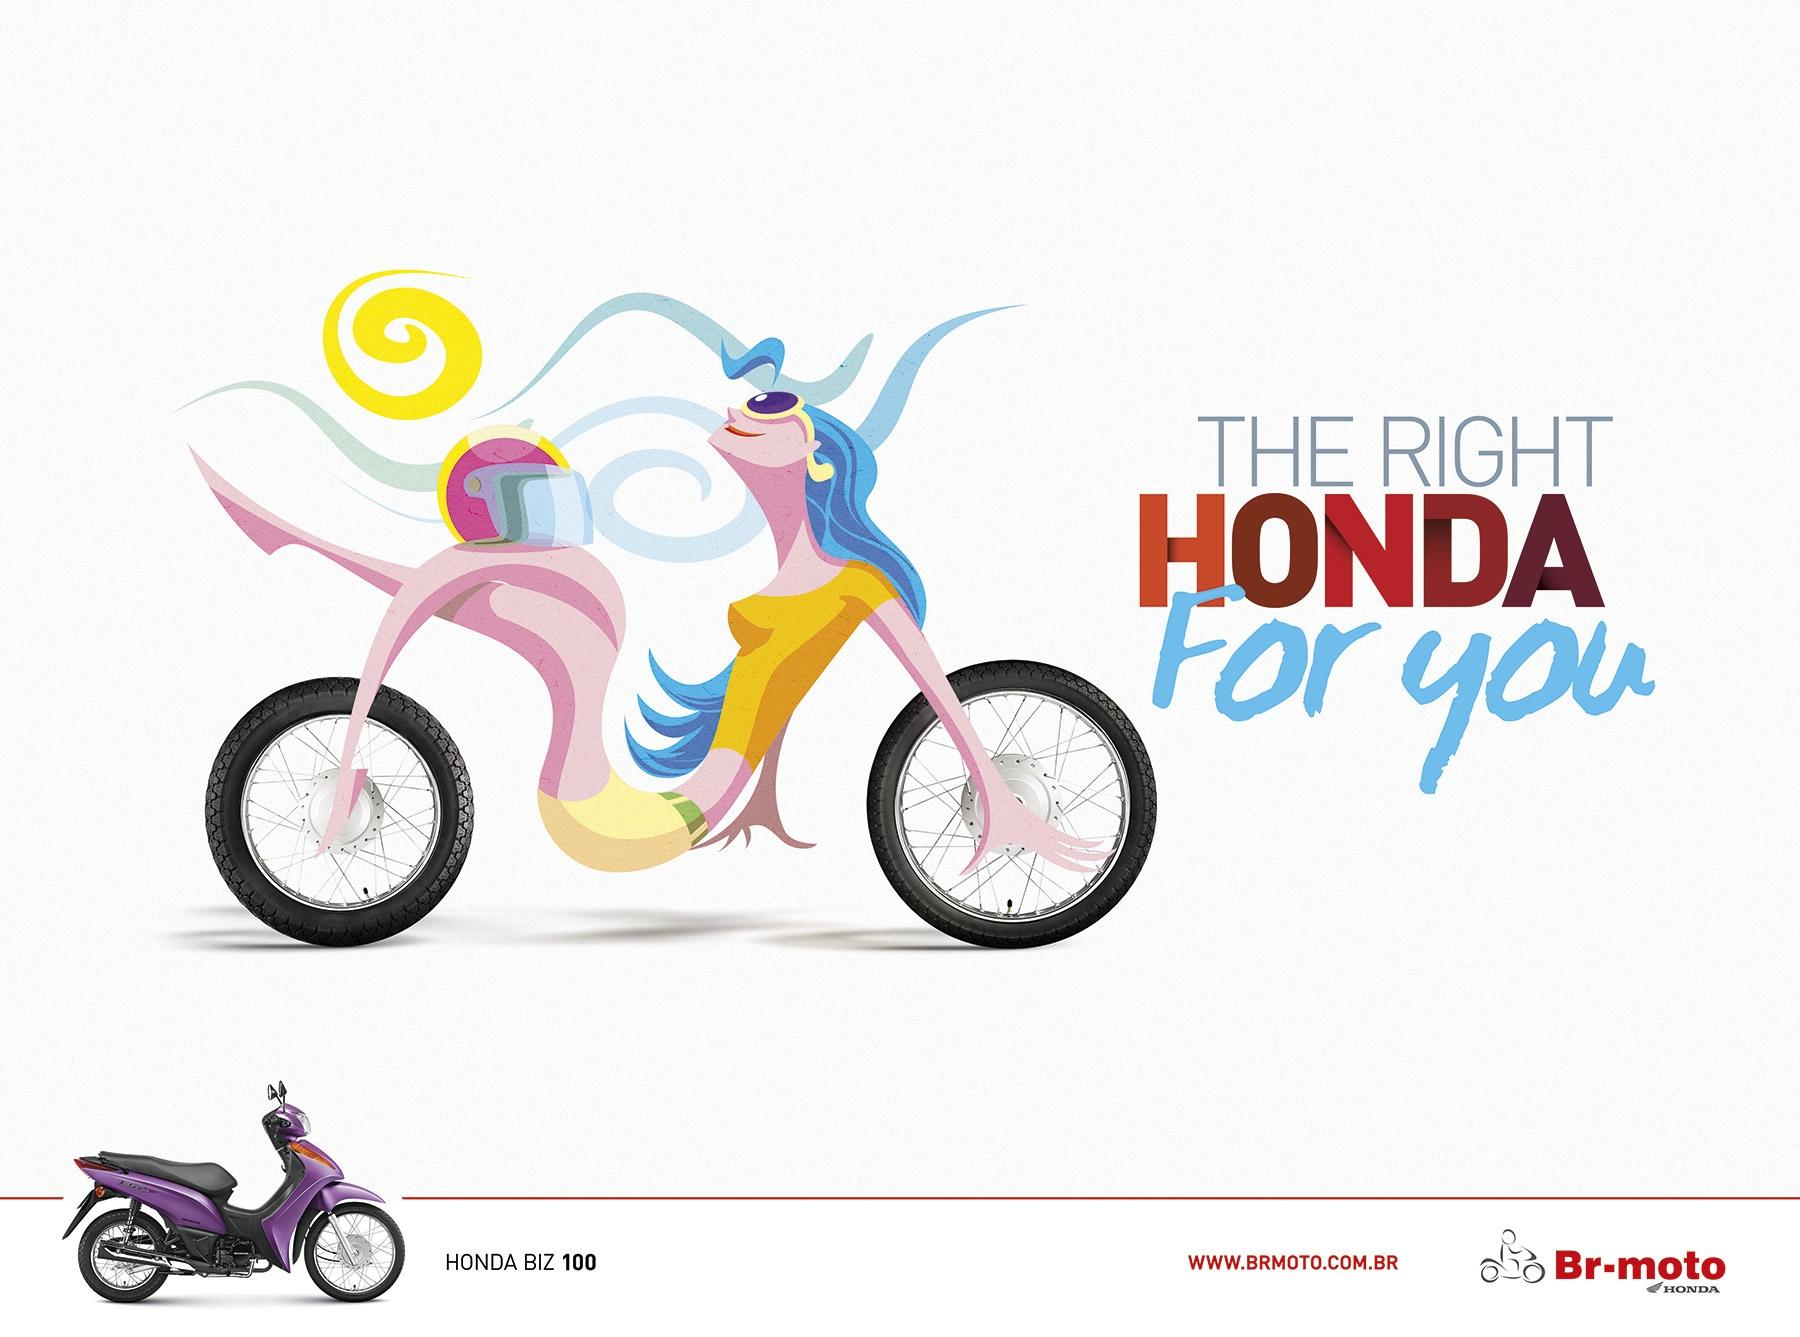 BR Motos Print Ad -  The right honda for you, 2